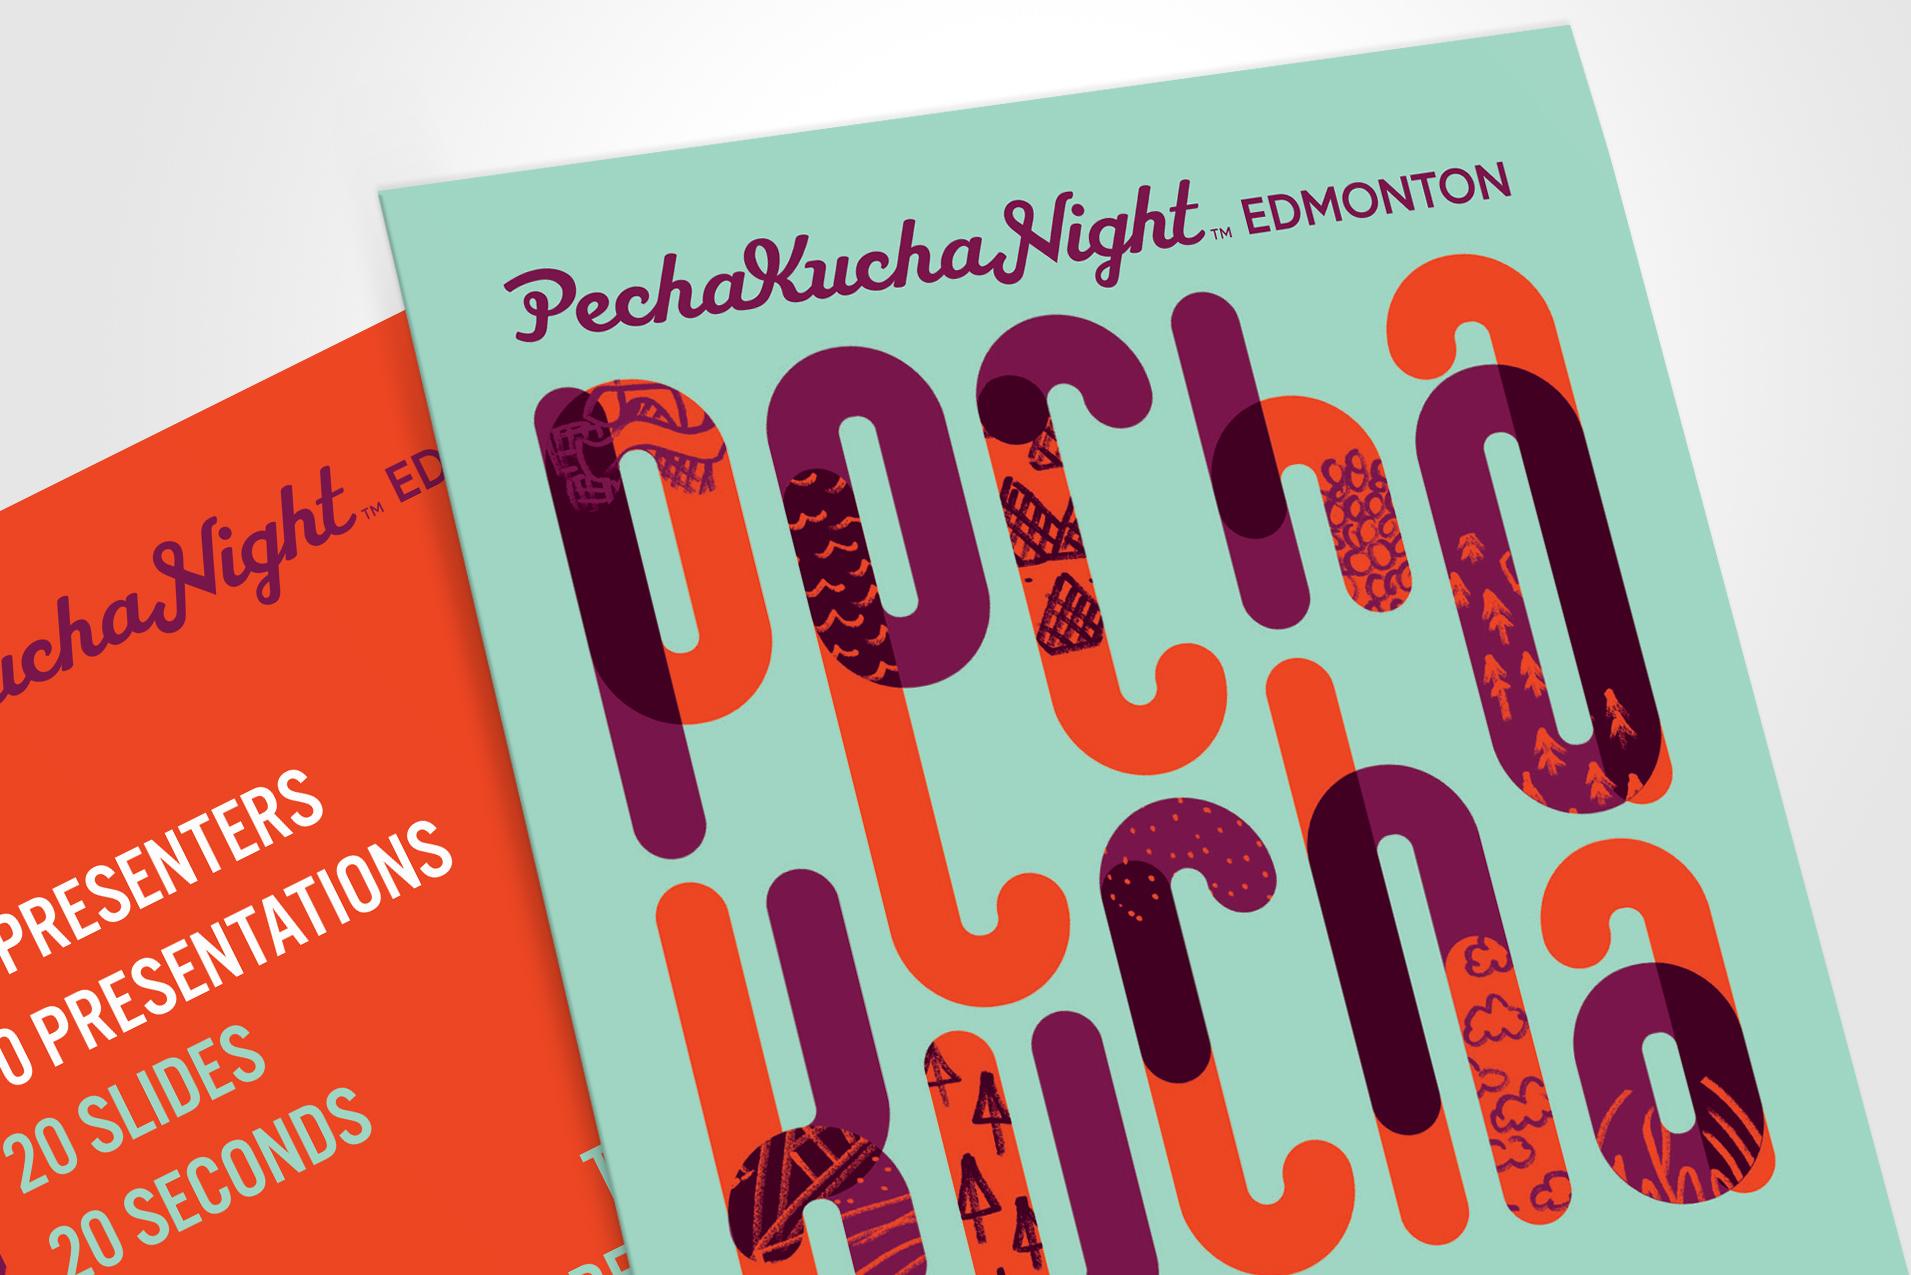 Natasia Designs Edmonton Graphic Design Event Promotion Materials Design Invitation Presentation Design Pecha Kucha Night 32 City of Edmonton Edmonton's Nextgen Designer Abstract Typography Illustration Lettering